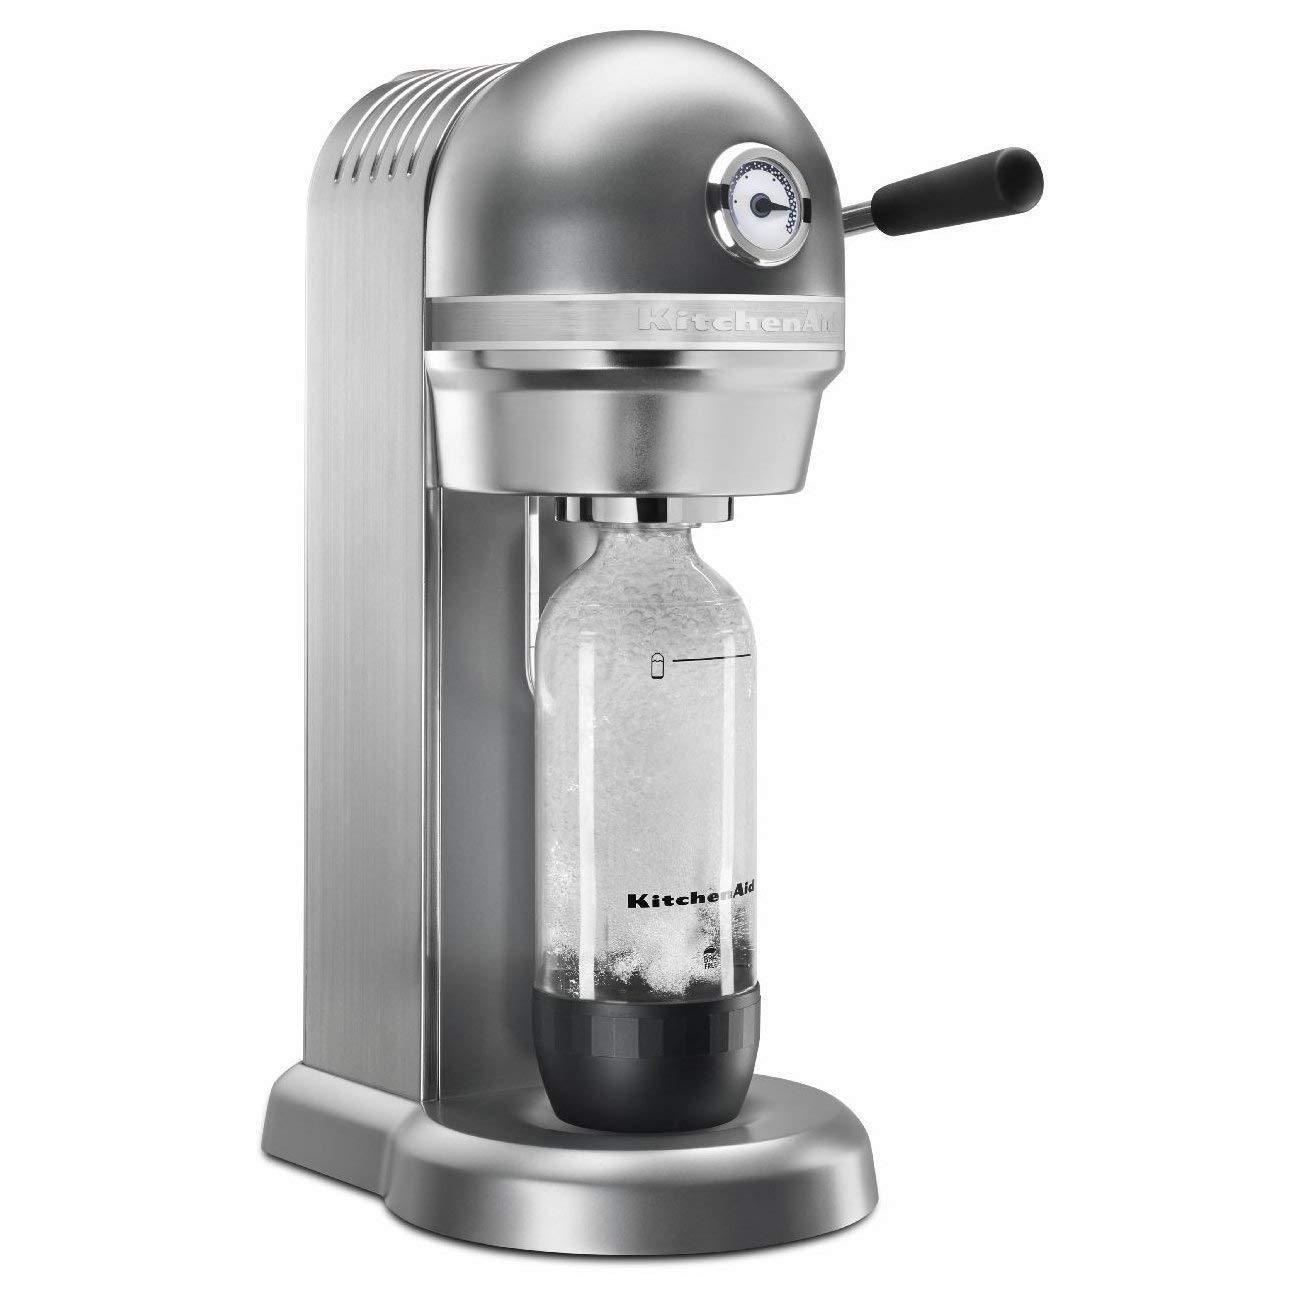 KitchenAid RKSS1121CU Sparkling Beverage Maker, Contour Silver (Renewed) by KitchenAid (Image #1)